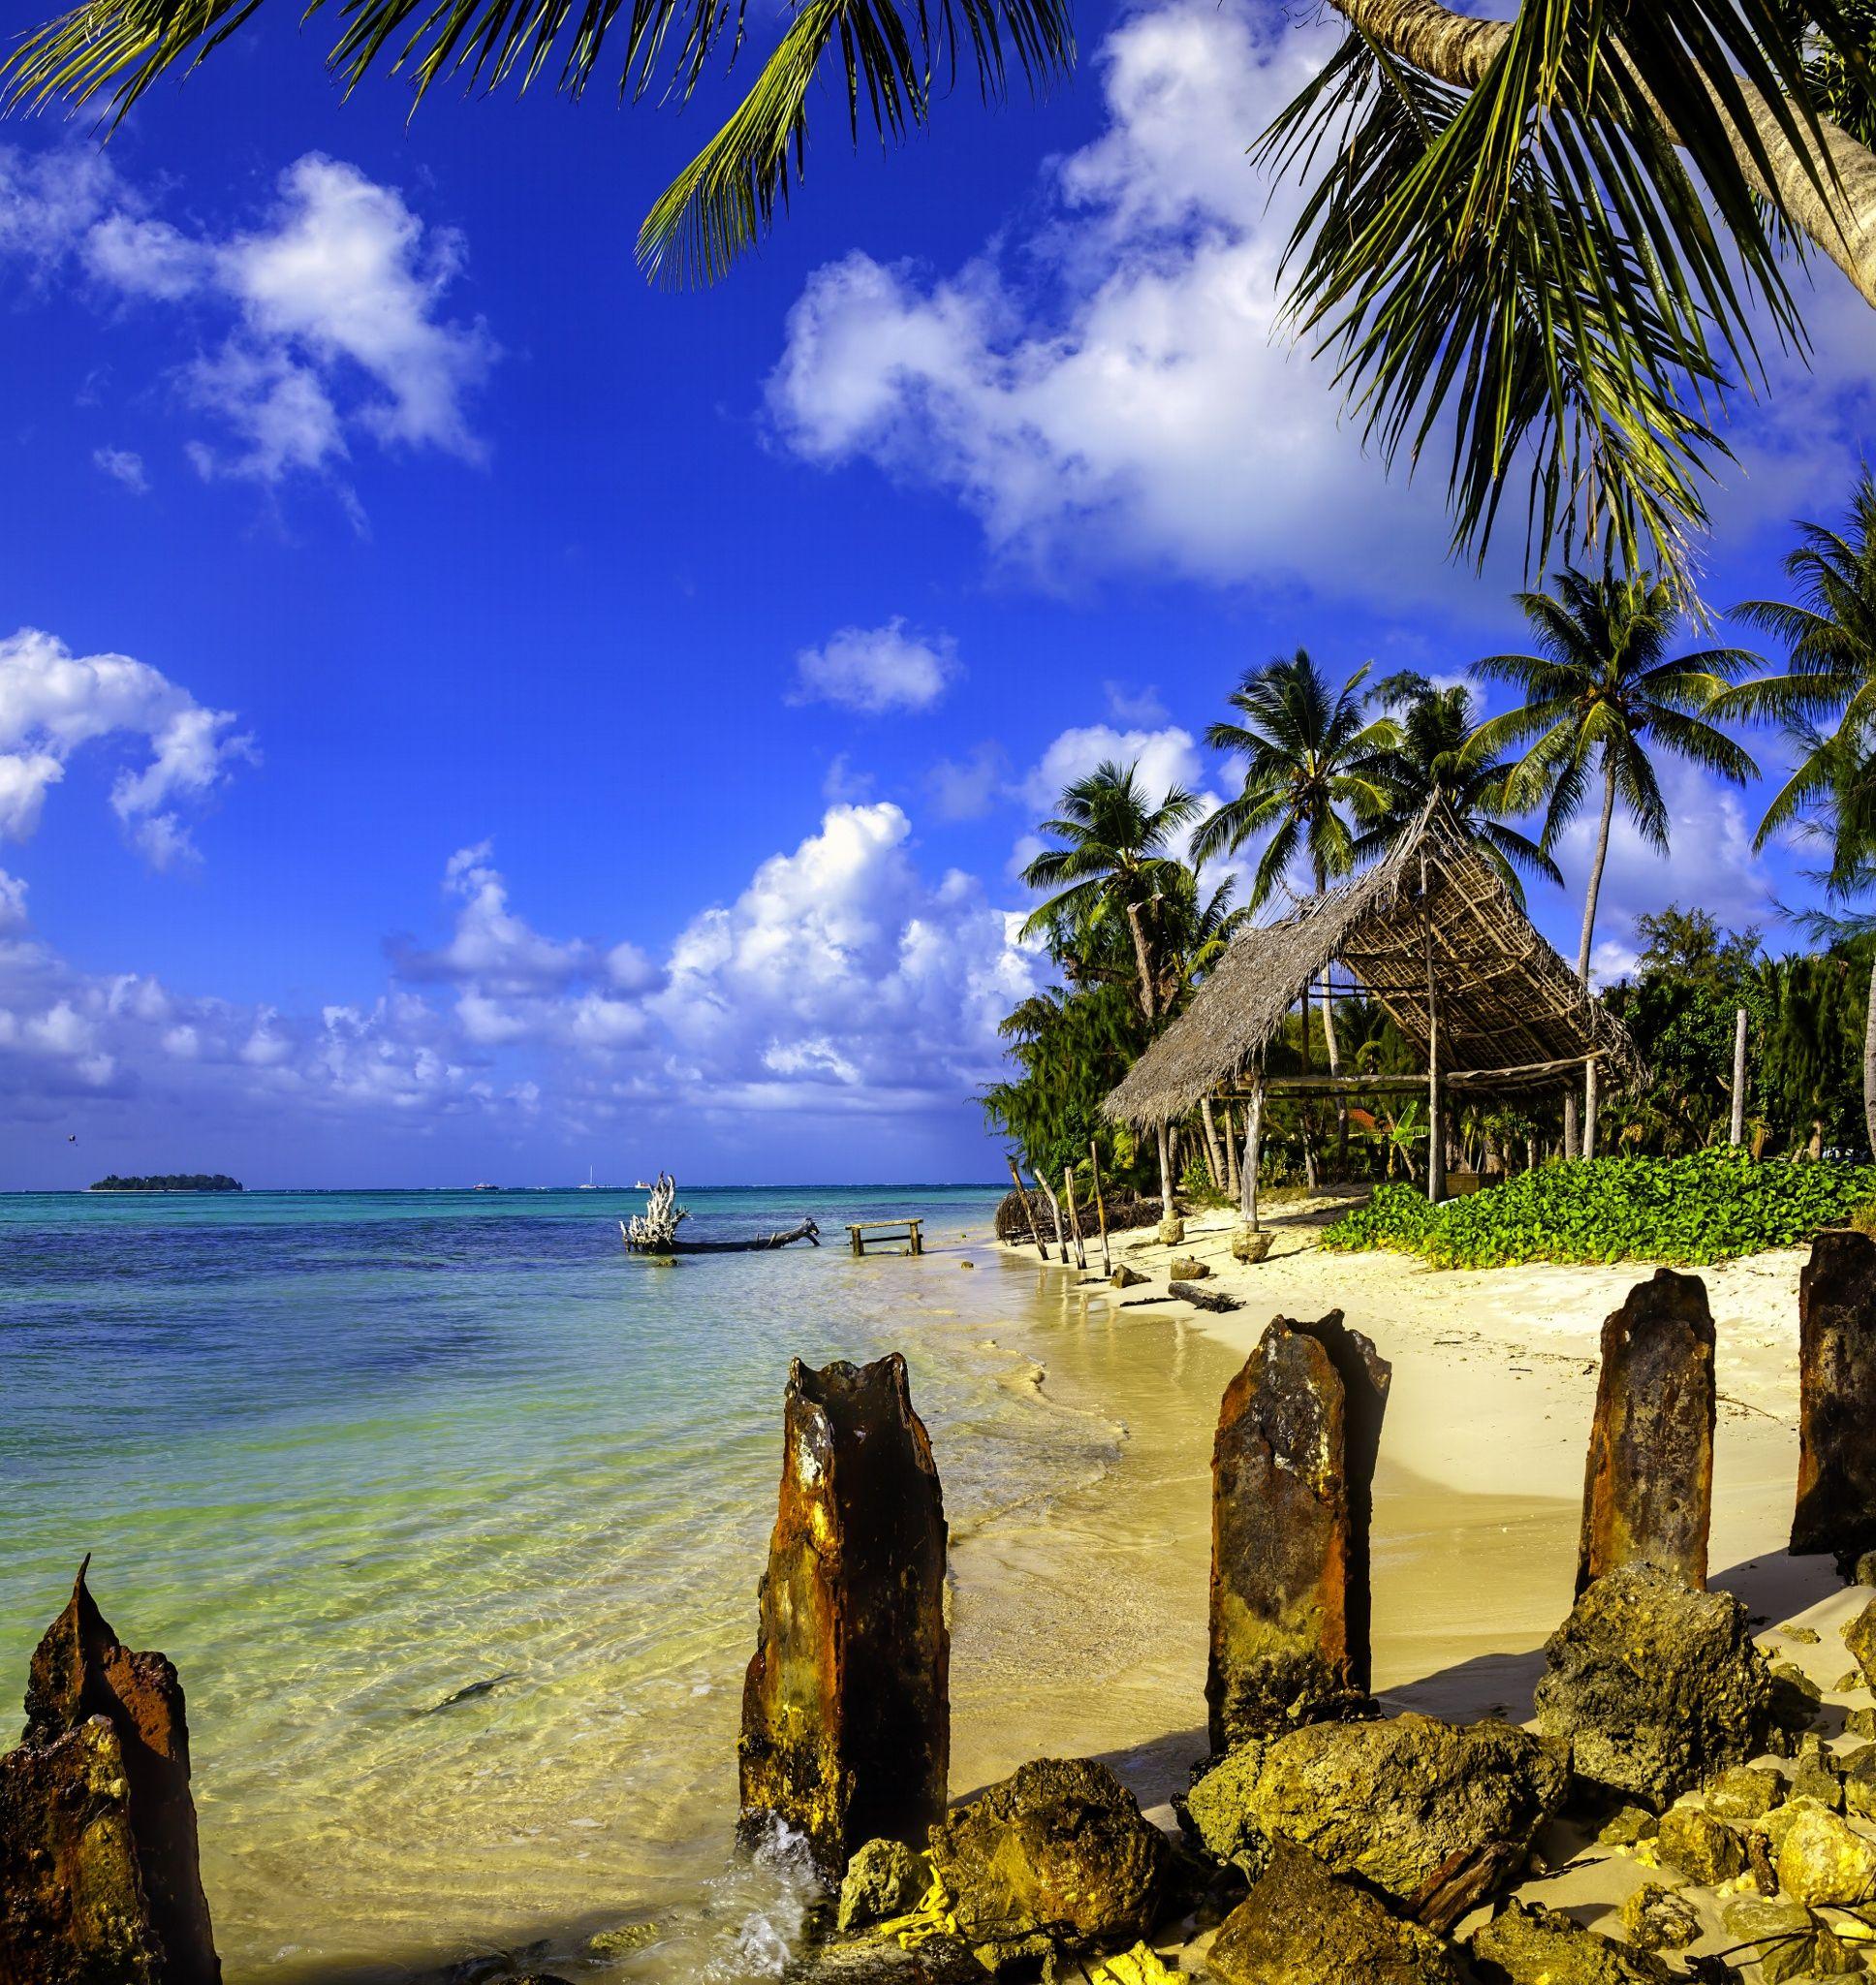 South Pacific Beaches: Grass Hut On Micro Beach, Saipan, Commonwealth Of The